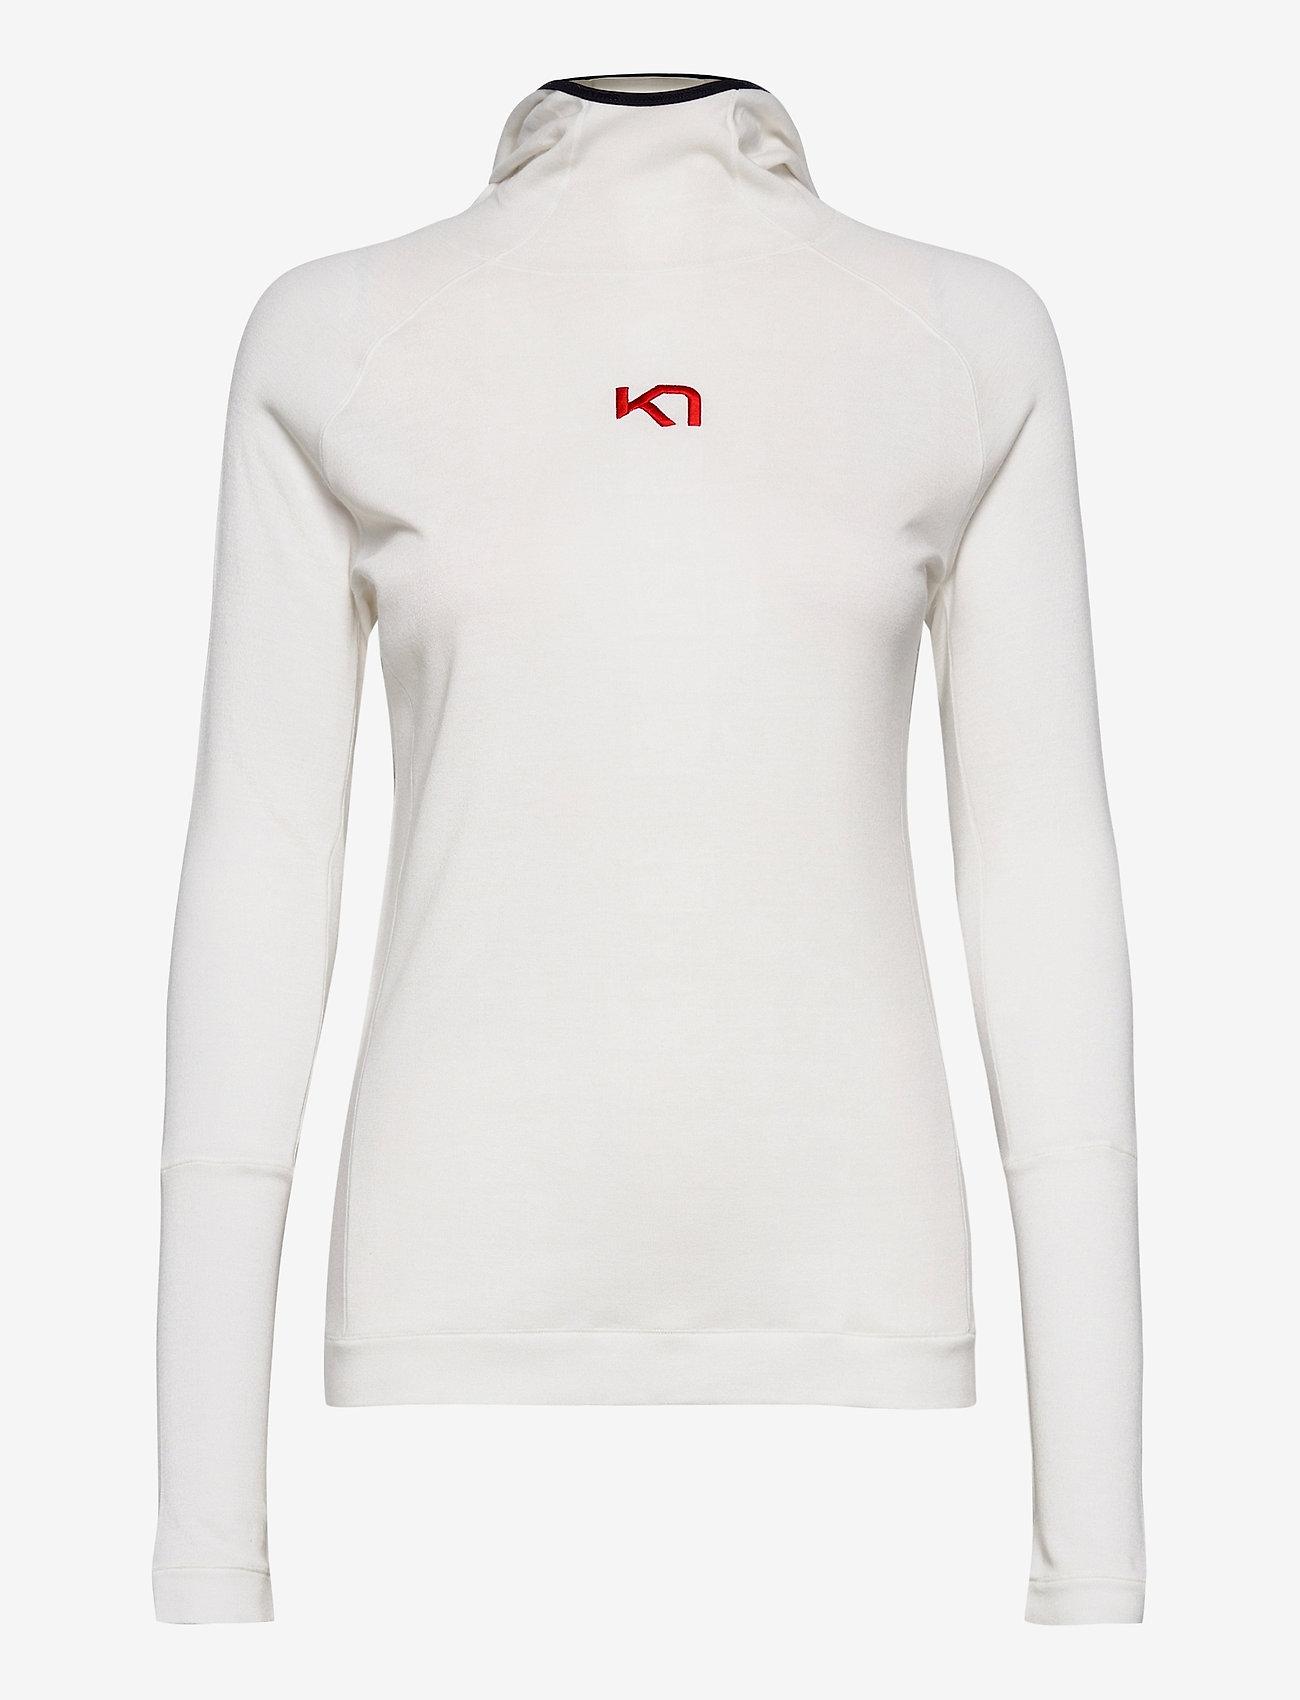 Kari Traa - RULLE HOOD - thermo ondershirts - bwhite - 0